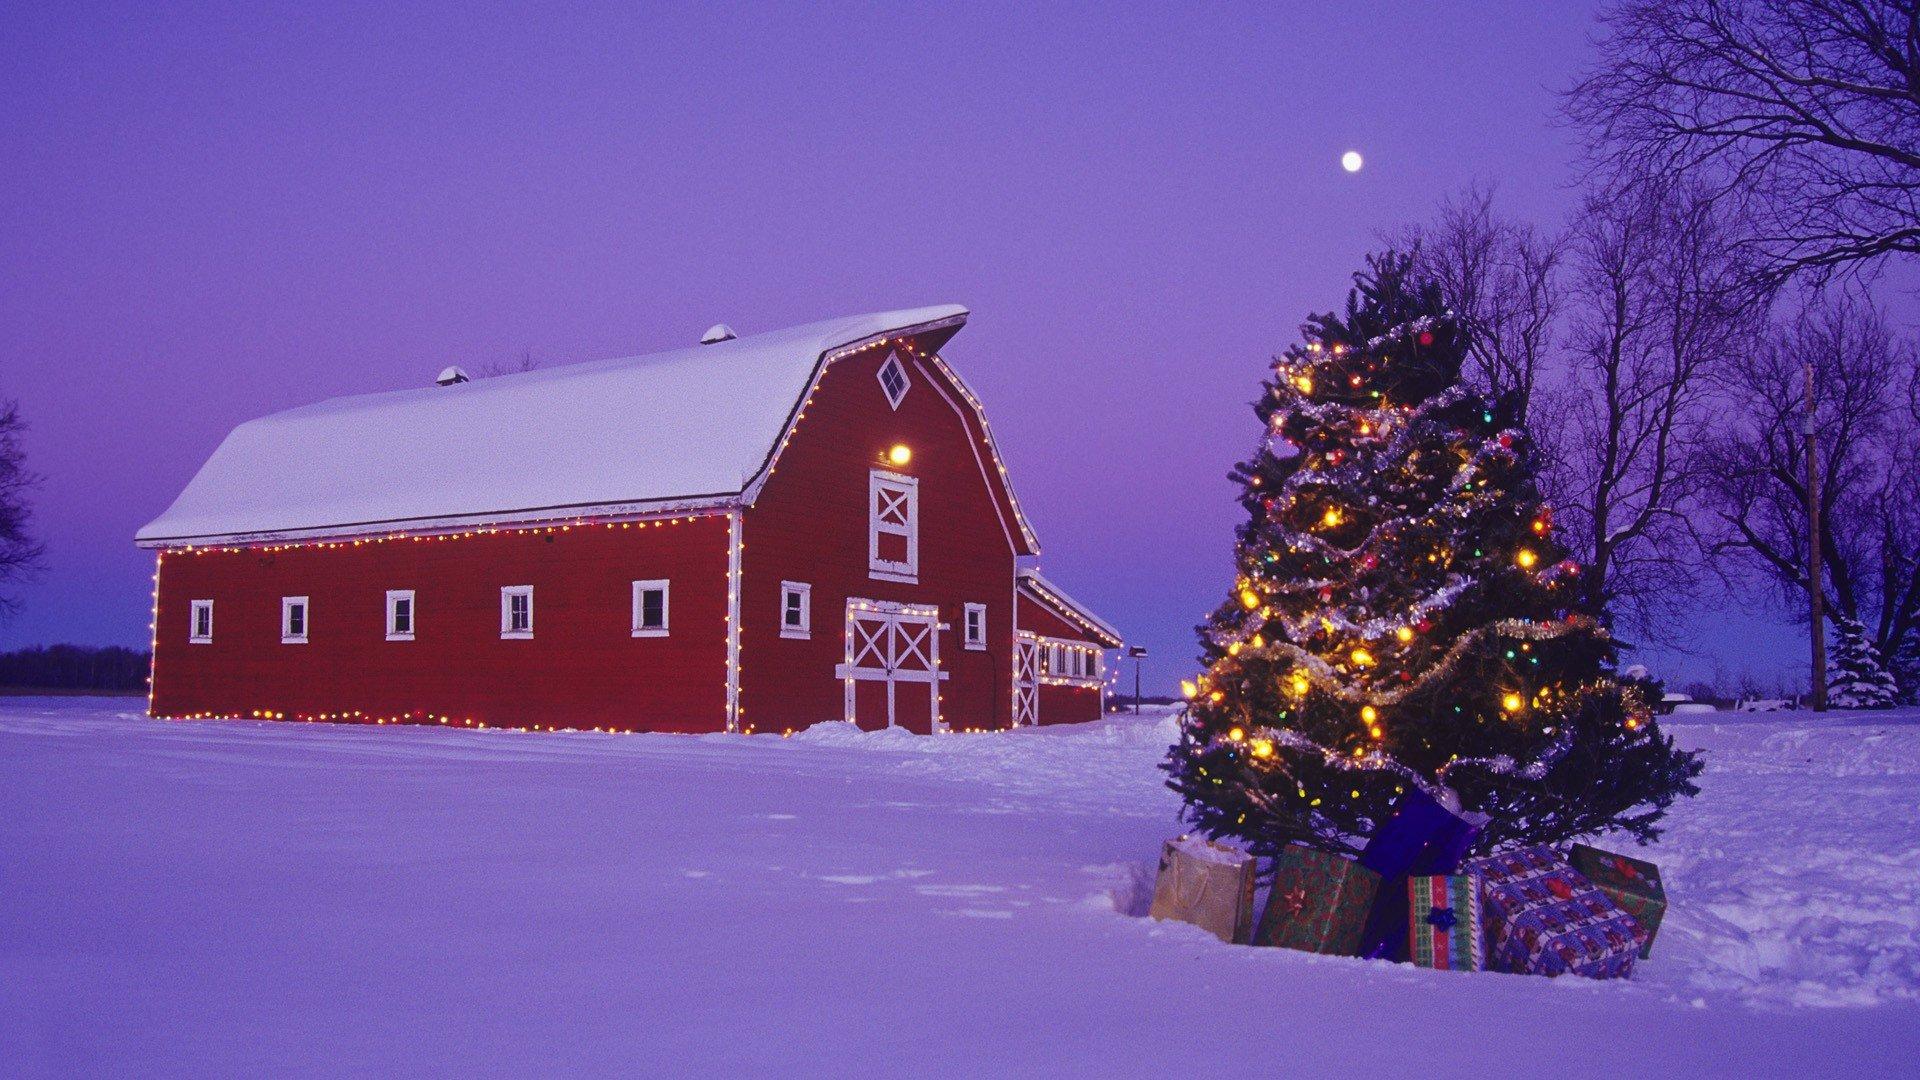 barn wallpaper iphone - photo #33